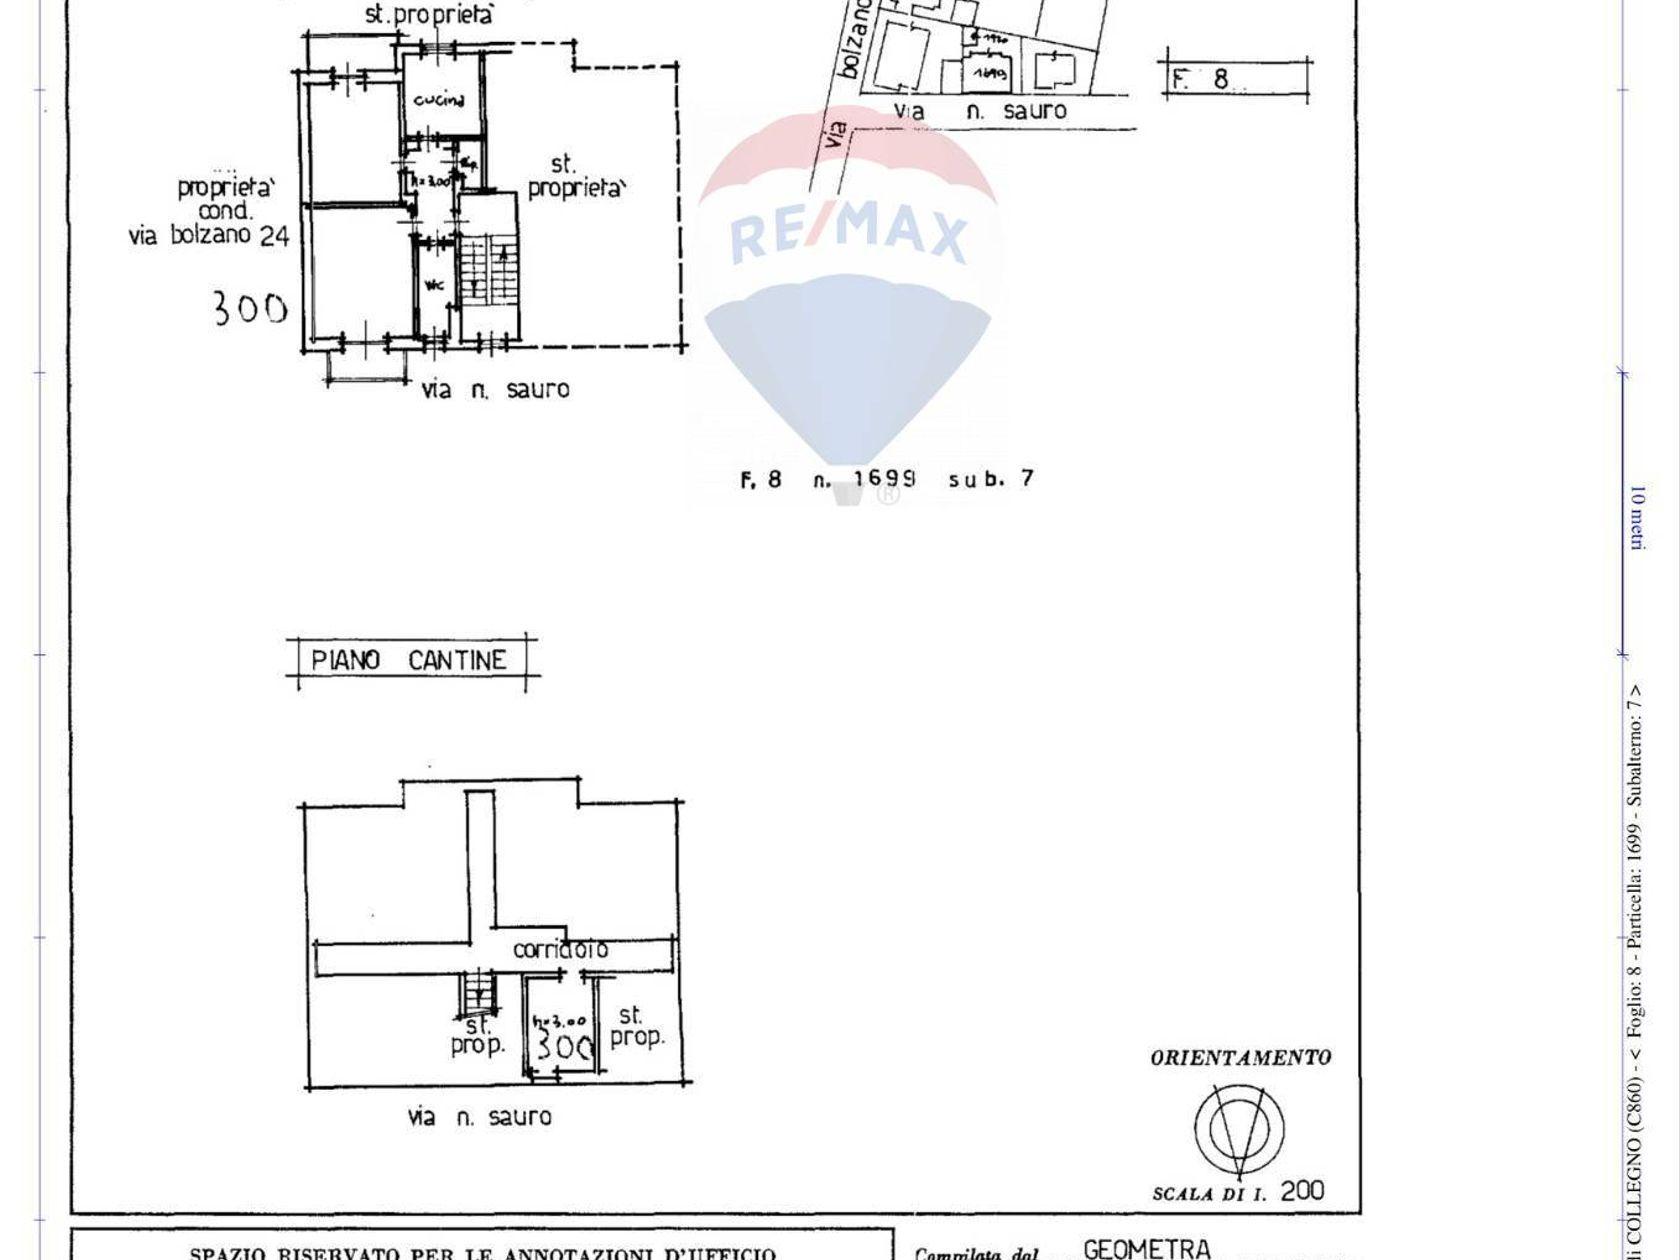 Casa Indipendente Santa Maria, Collegno, TO Vendita - Planimetria 5